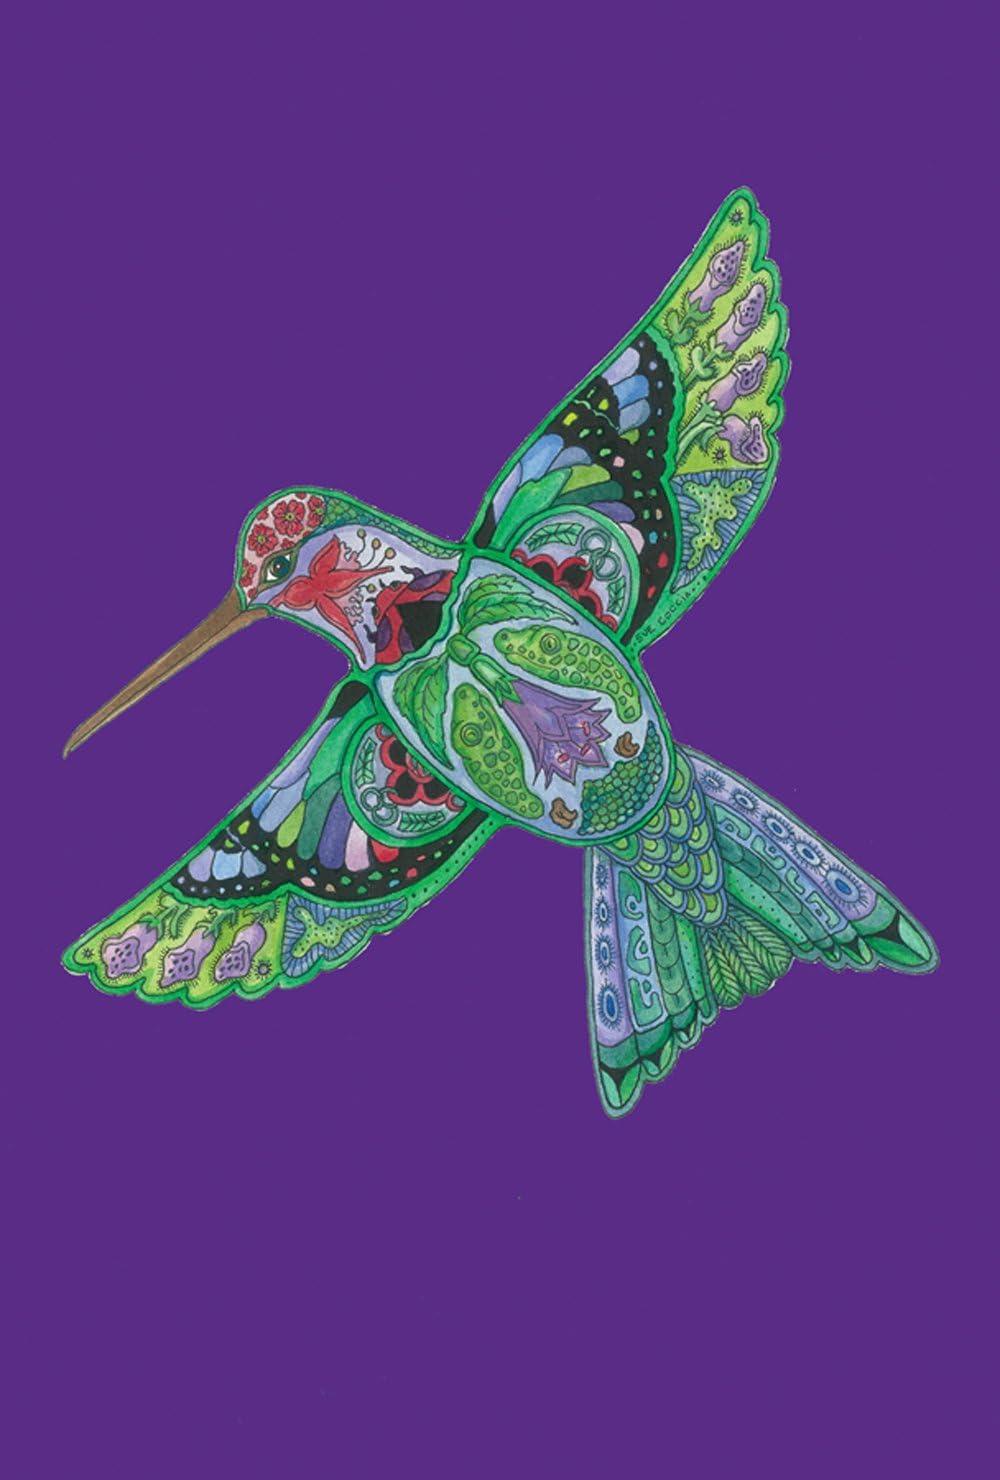 Toland Home Garden 1110046 Animal Spirits-Hummingbird 12.5 x 18 Inch Decorative, Garden Flag-12.5